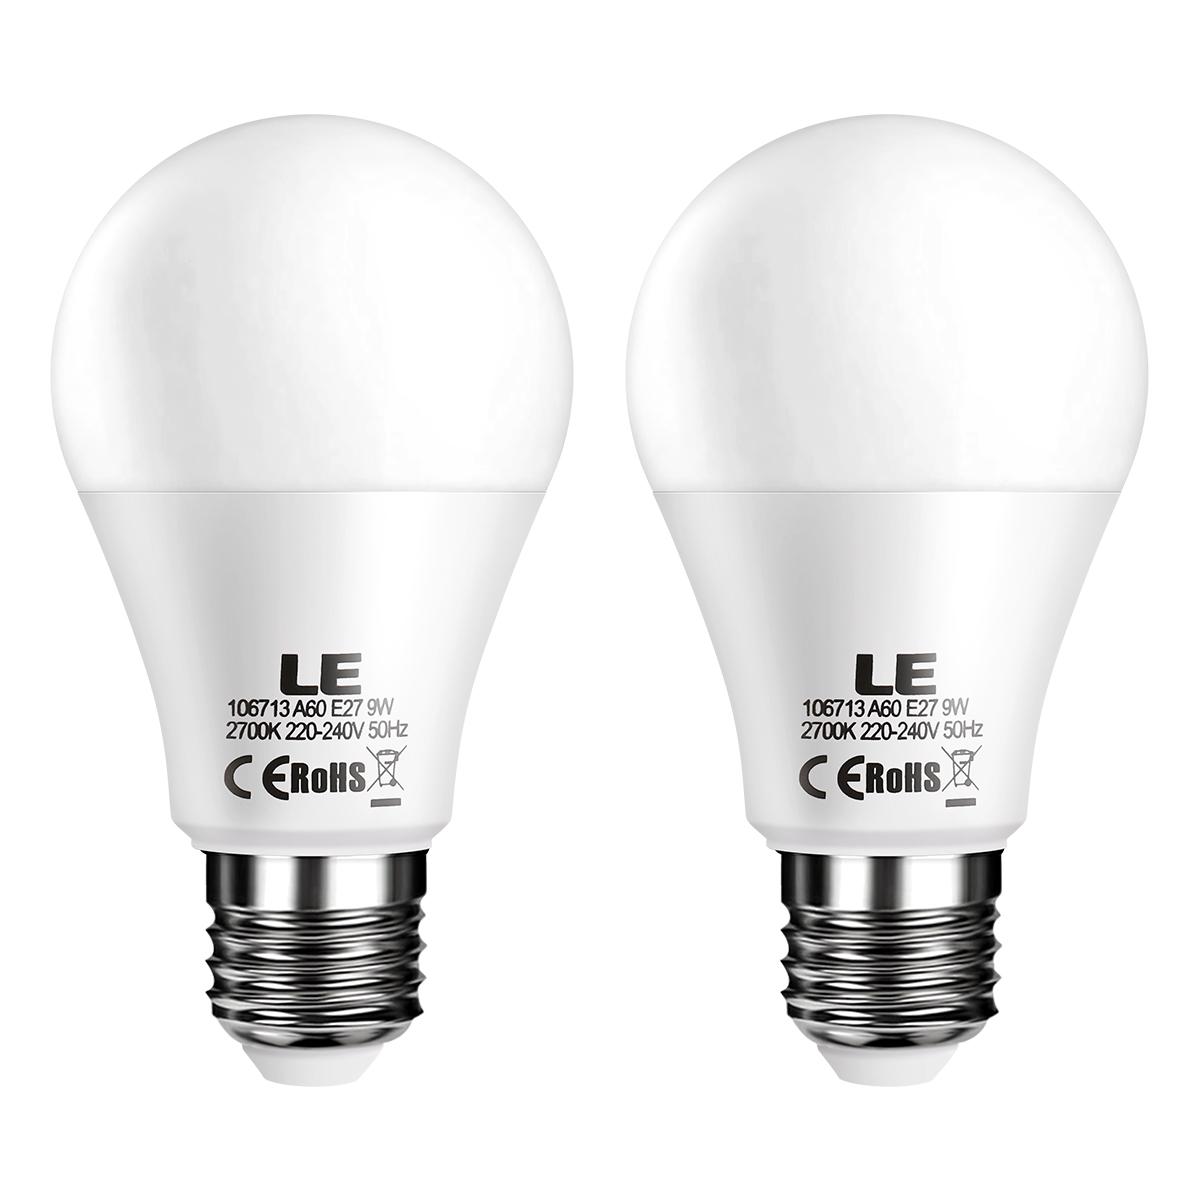 9W E27 A60 LED Lampen, 800lm, Warmwei? 2700K LED Birnen, 200° Abstrahlwinkel, ersetzt 60W Glühbirne, 2er Pack